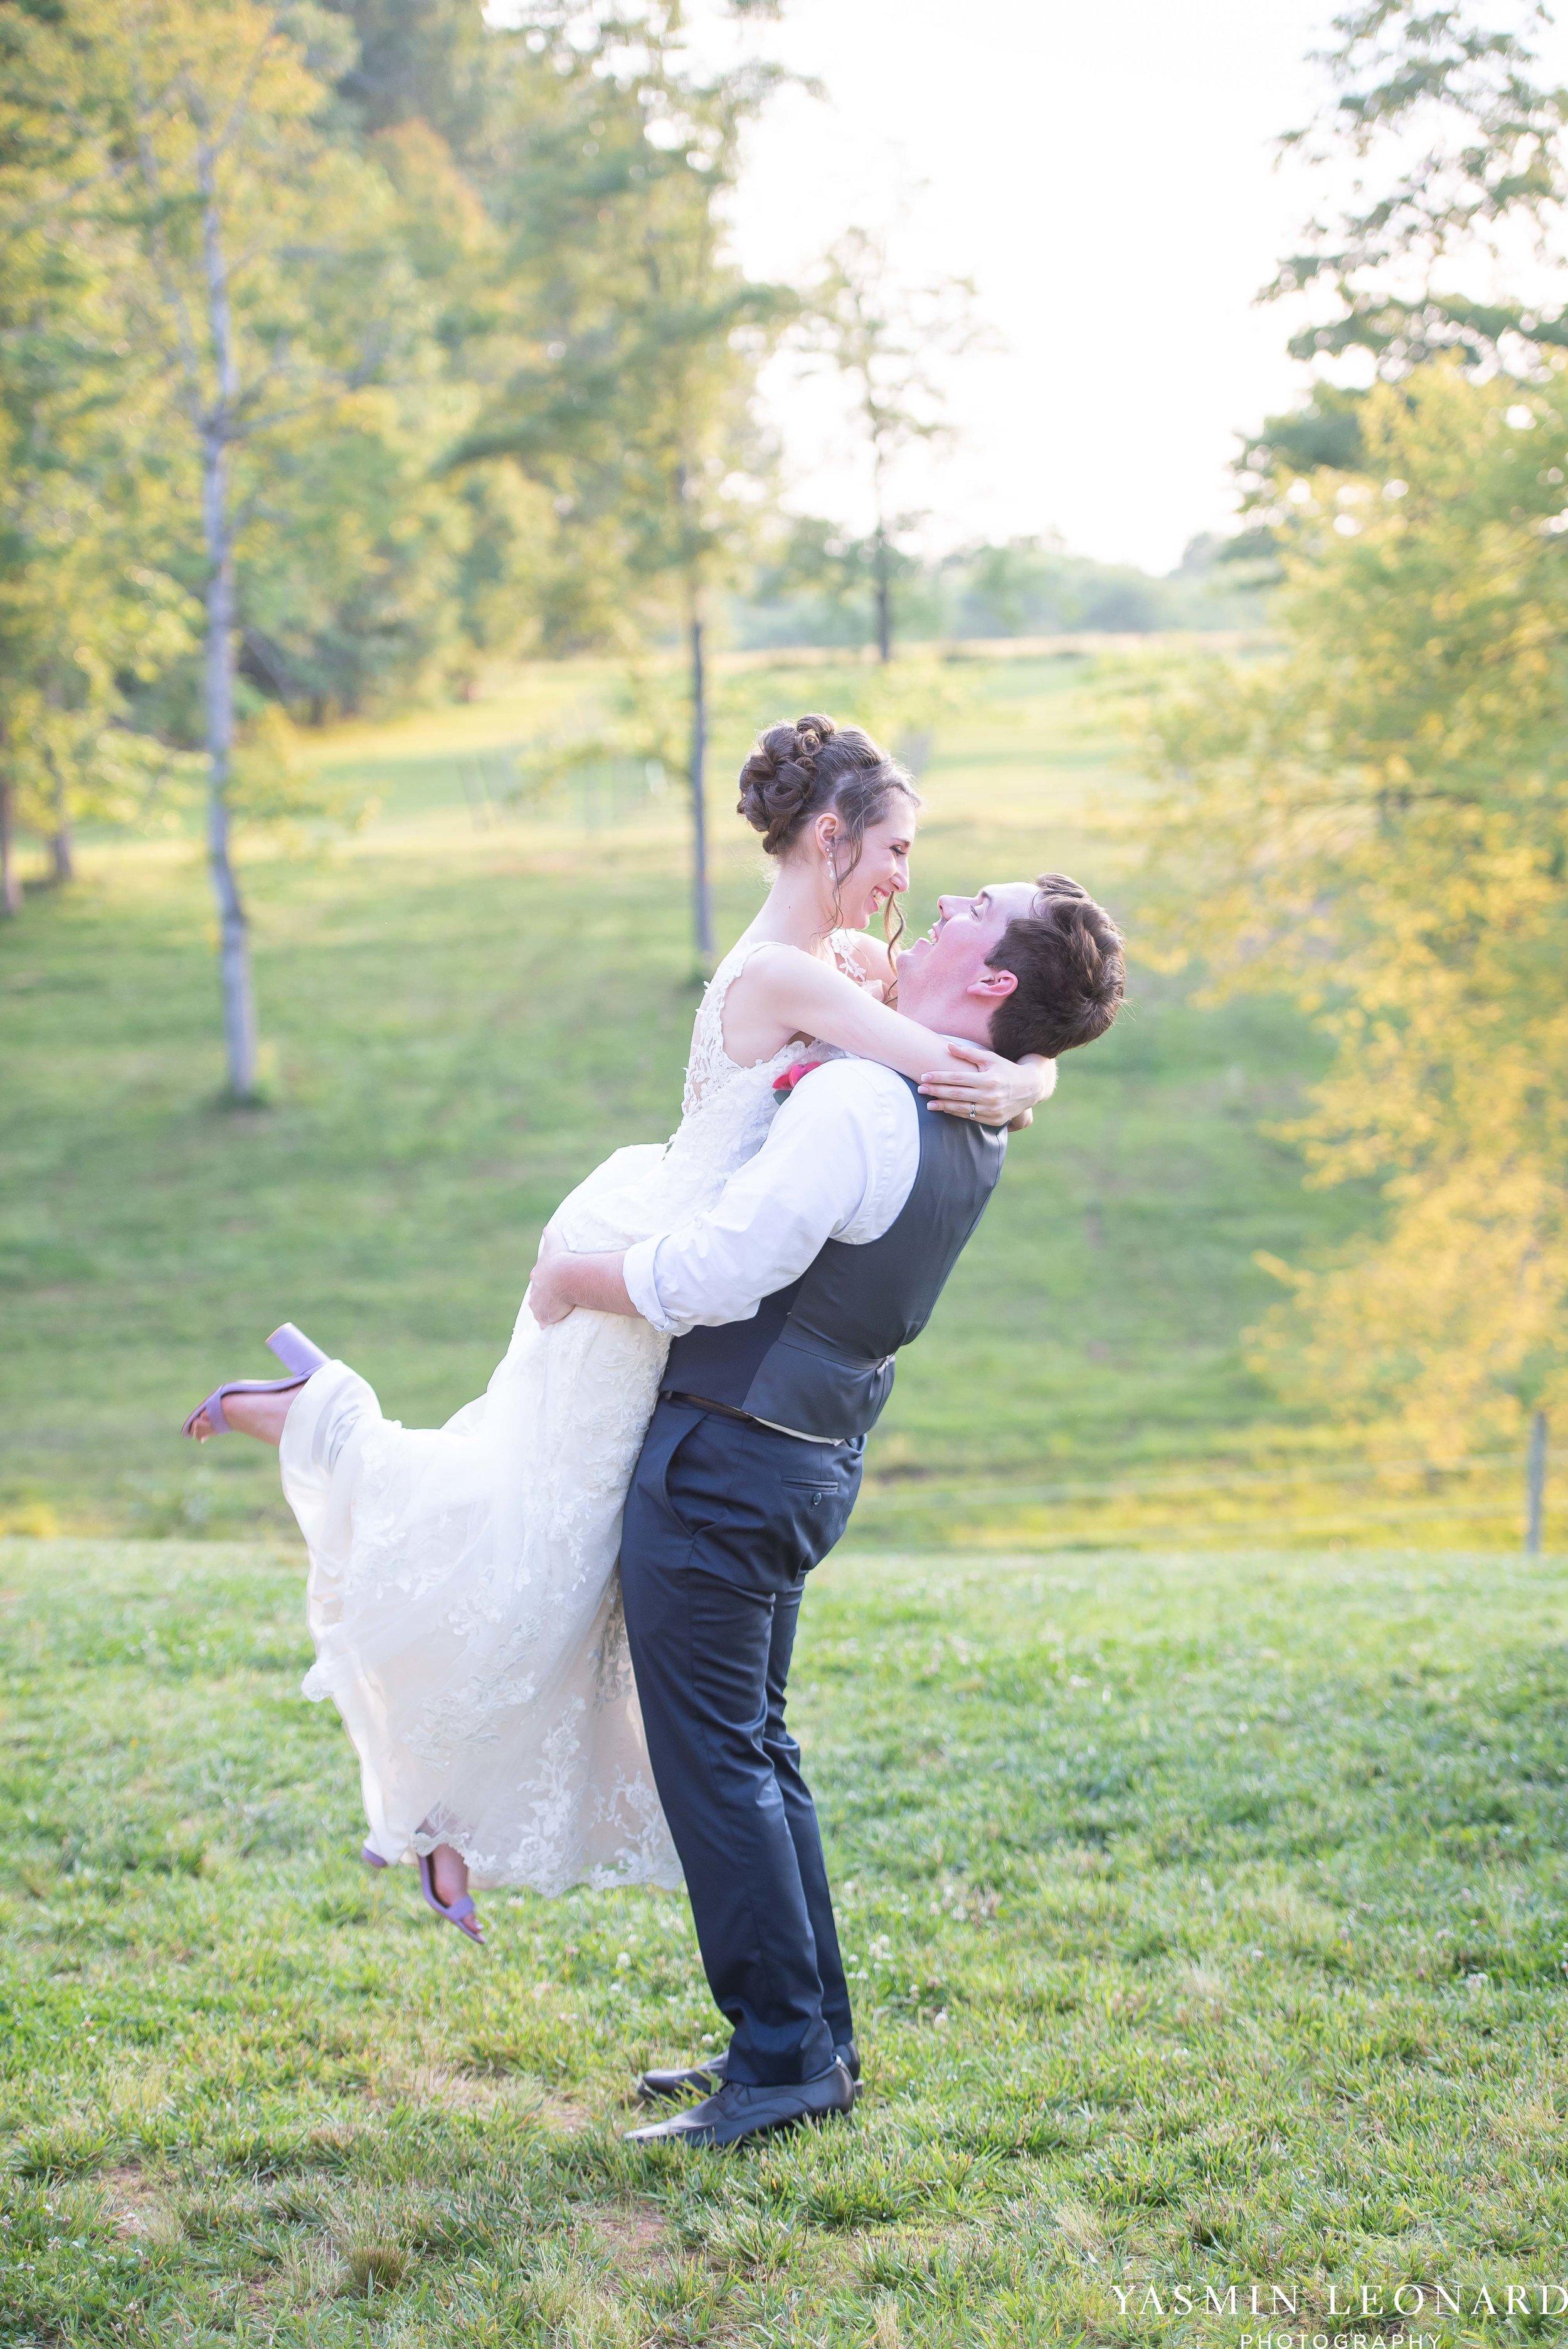 Old Homeplace Vineyard - NC Weddings - Outdoor Summer Weddings - Peony Boutique - Vineyard Wedding - NC Photographer - Yasmin Leonard Photography-57.jpg